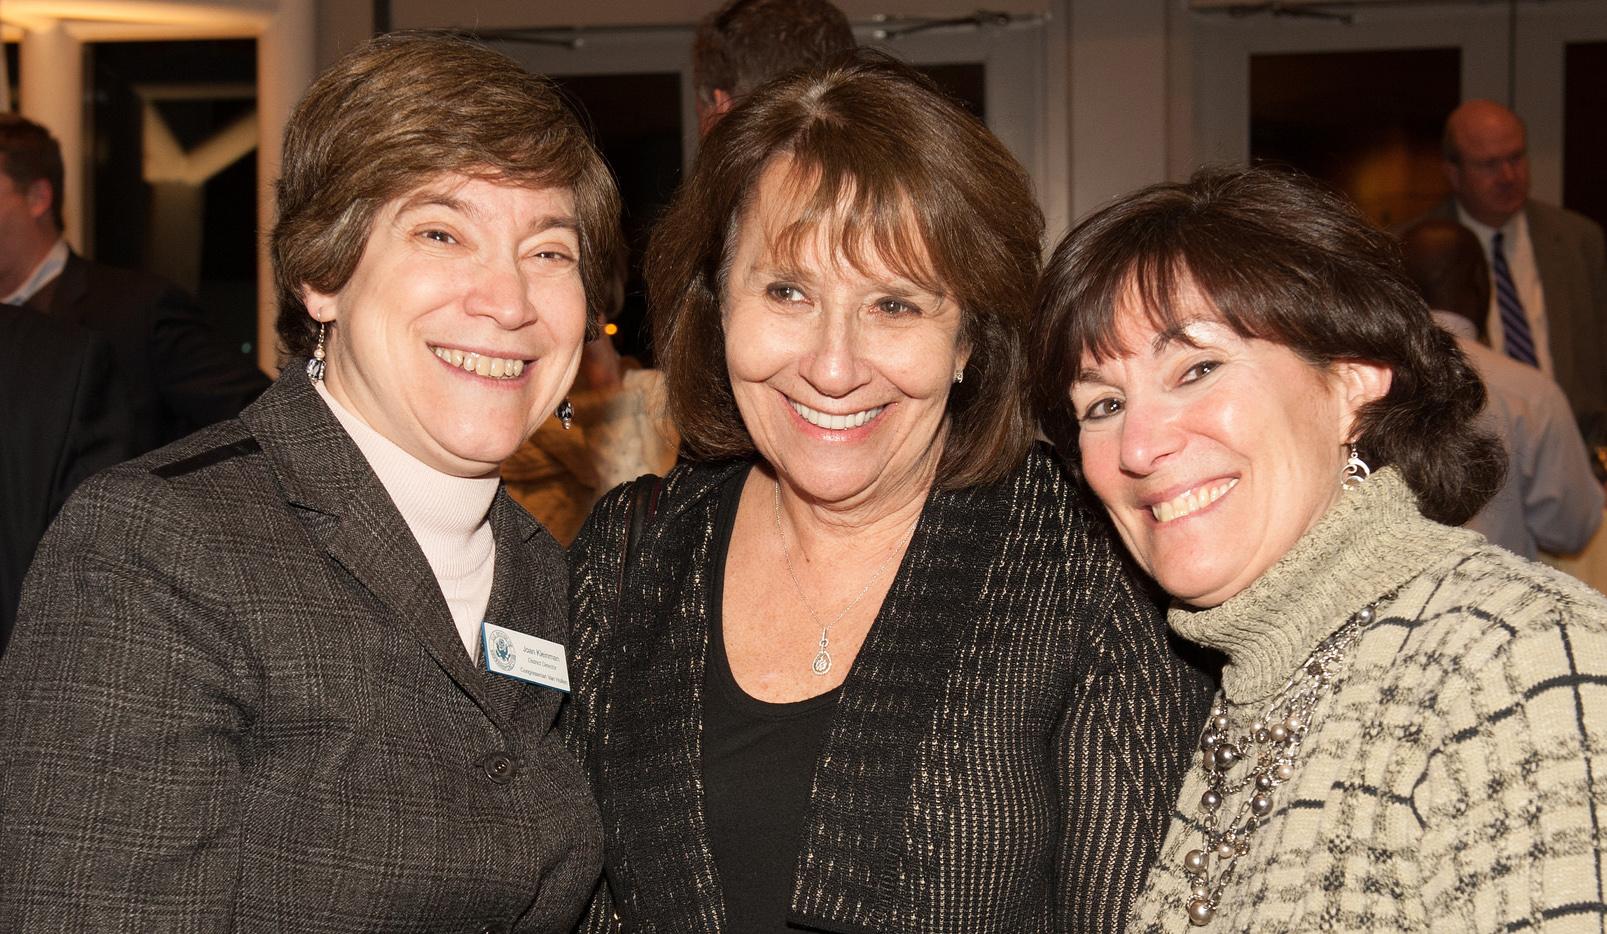 The Children's Inn Volunteers Robin Shapiro and Susan Cohen